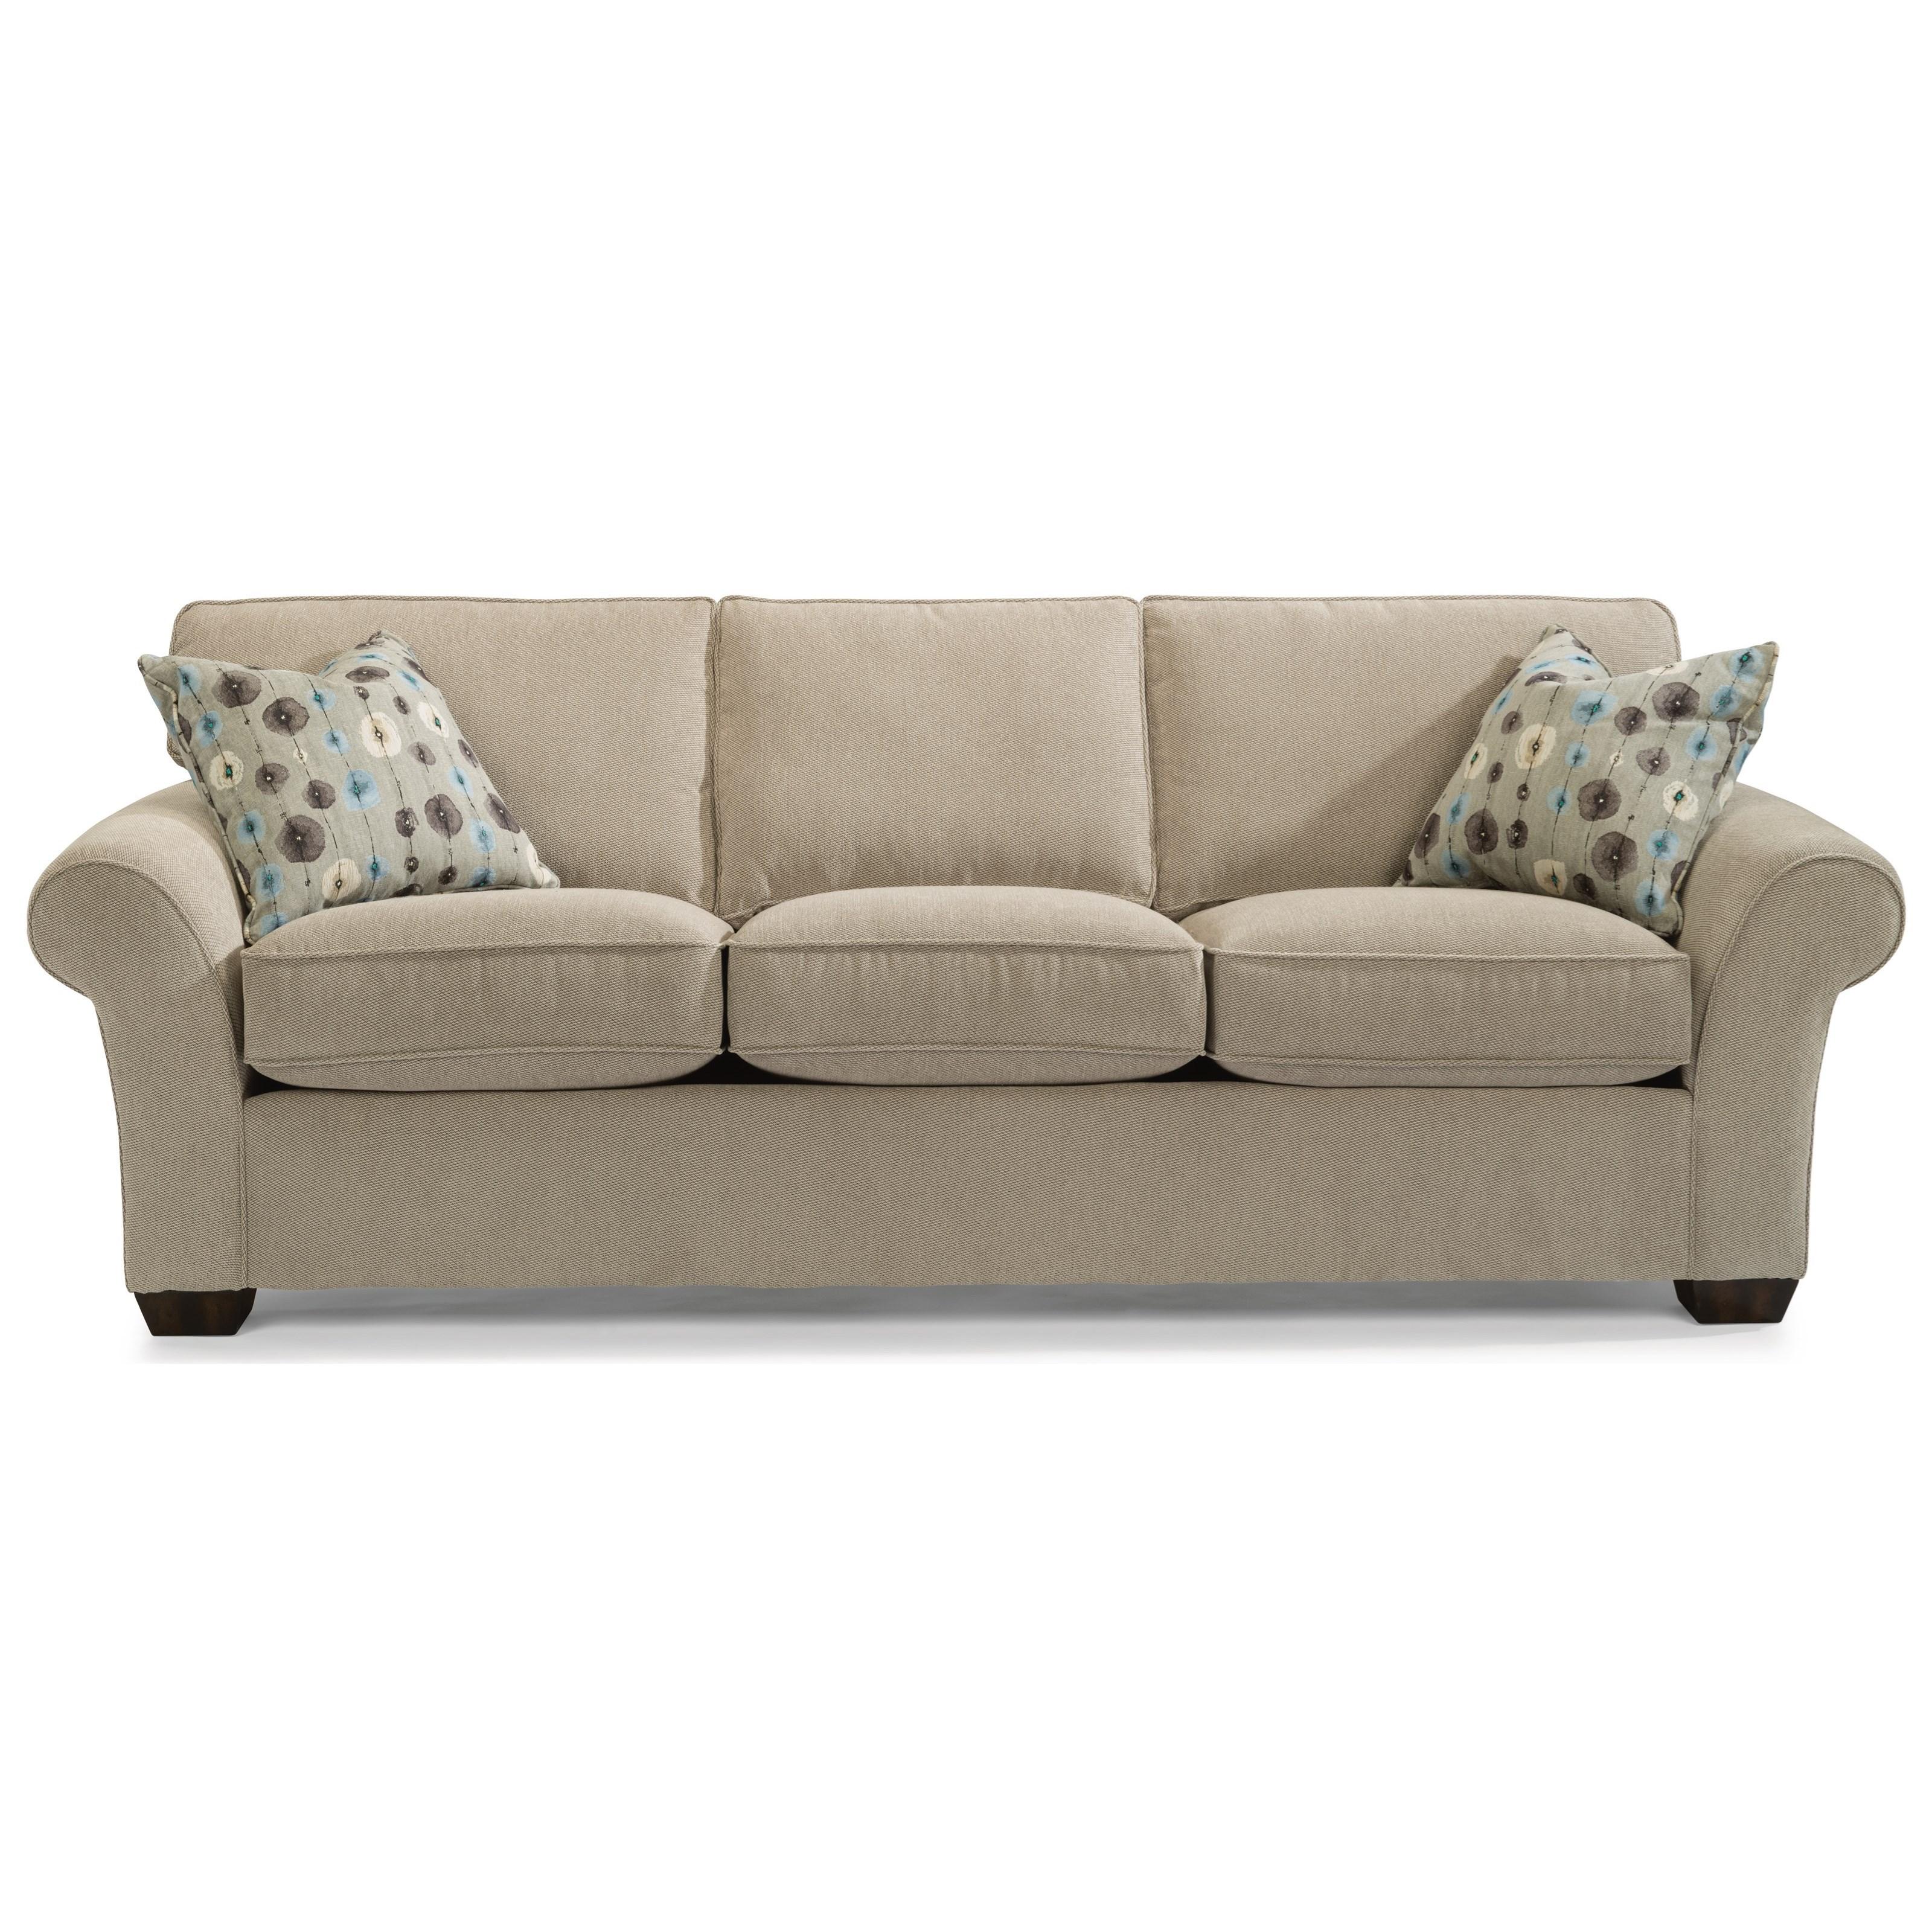 "Flexsteel Wrangler Sofa: Flexsteel Vail 7305-31 91"" Vail Three Cushion Sofa"